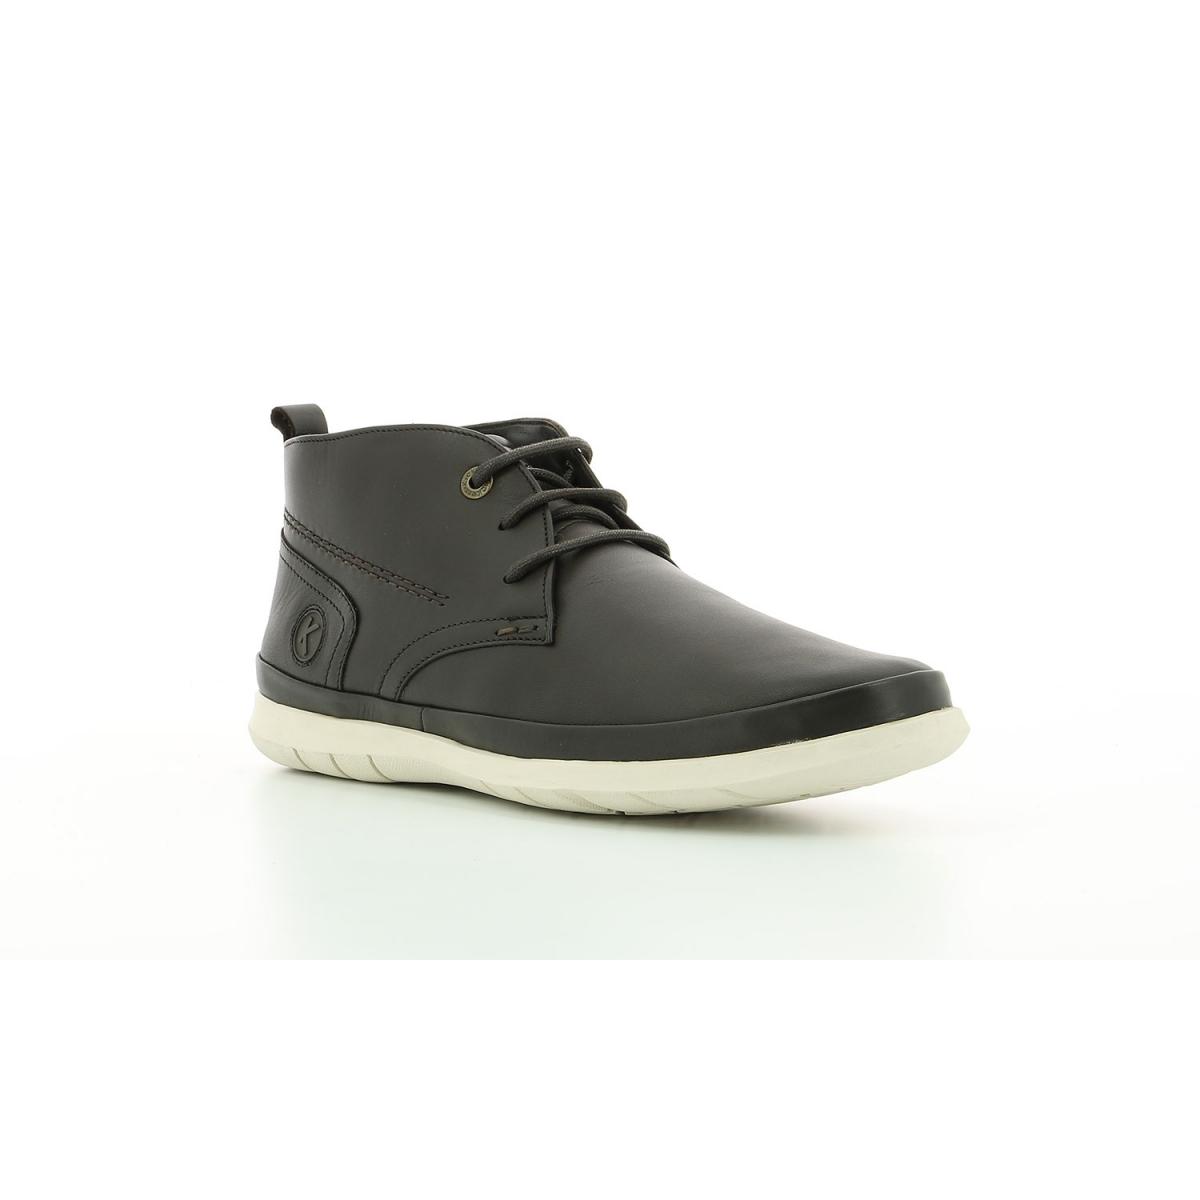 Boots Homme Layton marron foncé Chaussures Homme Kickers